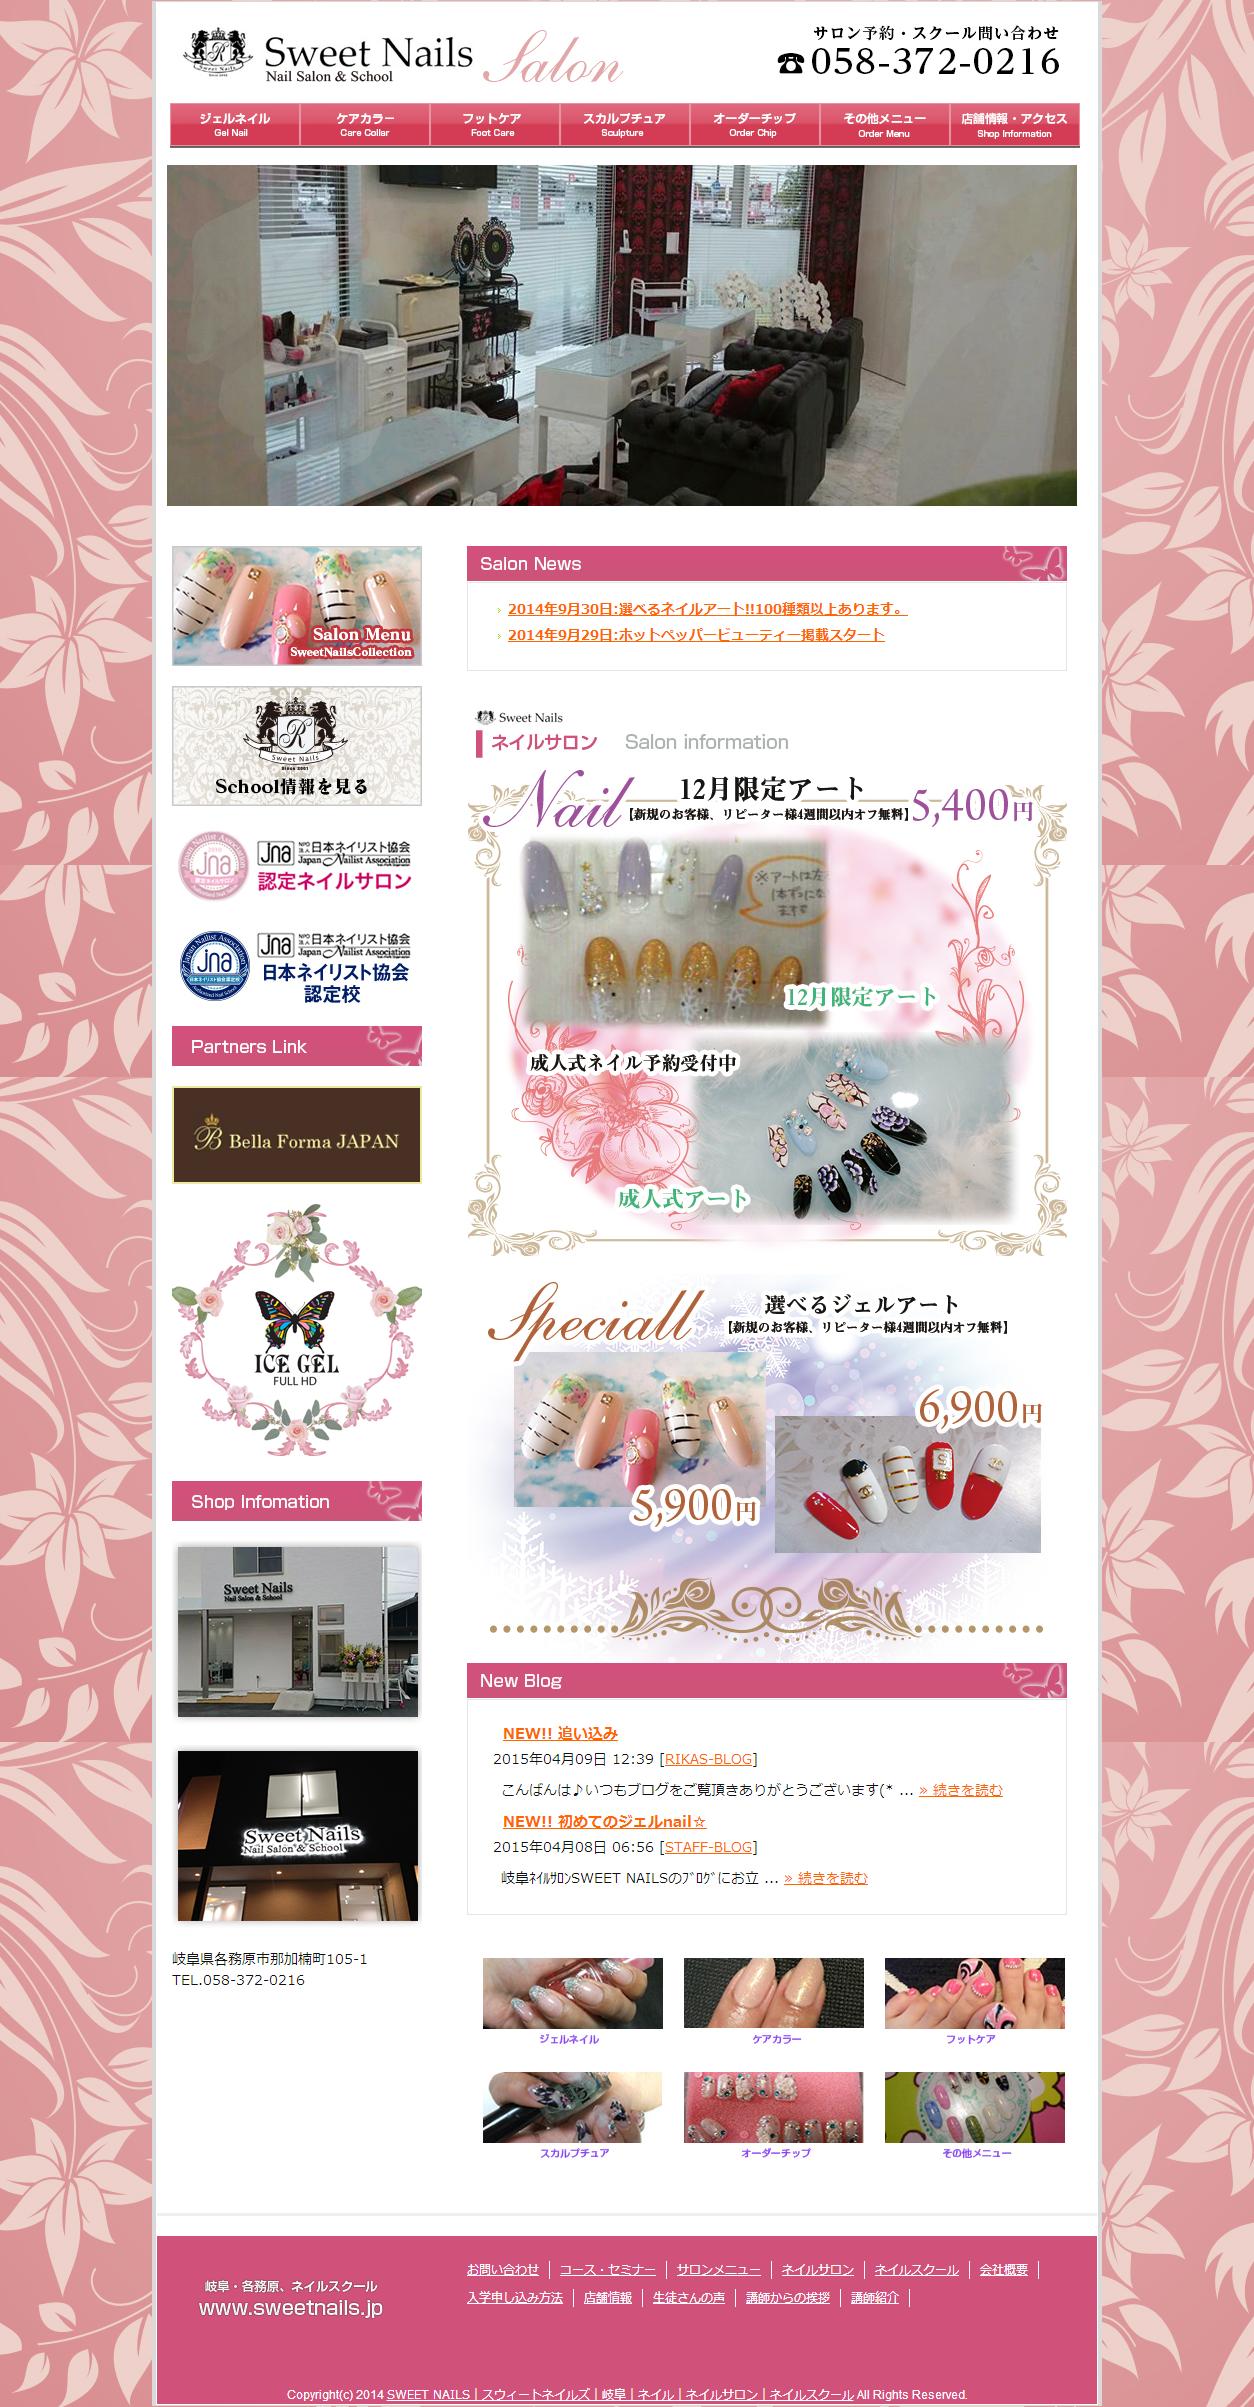 screencapture sweetnails jp salon 1428647106952 - ネイルサロン・スクール様のホームページの制作を担当しました。